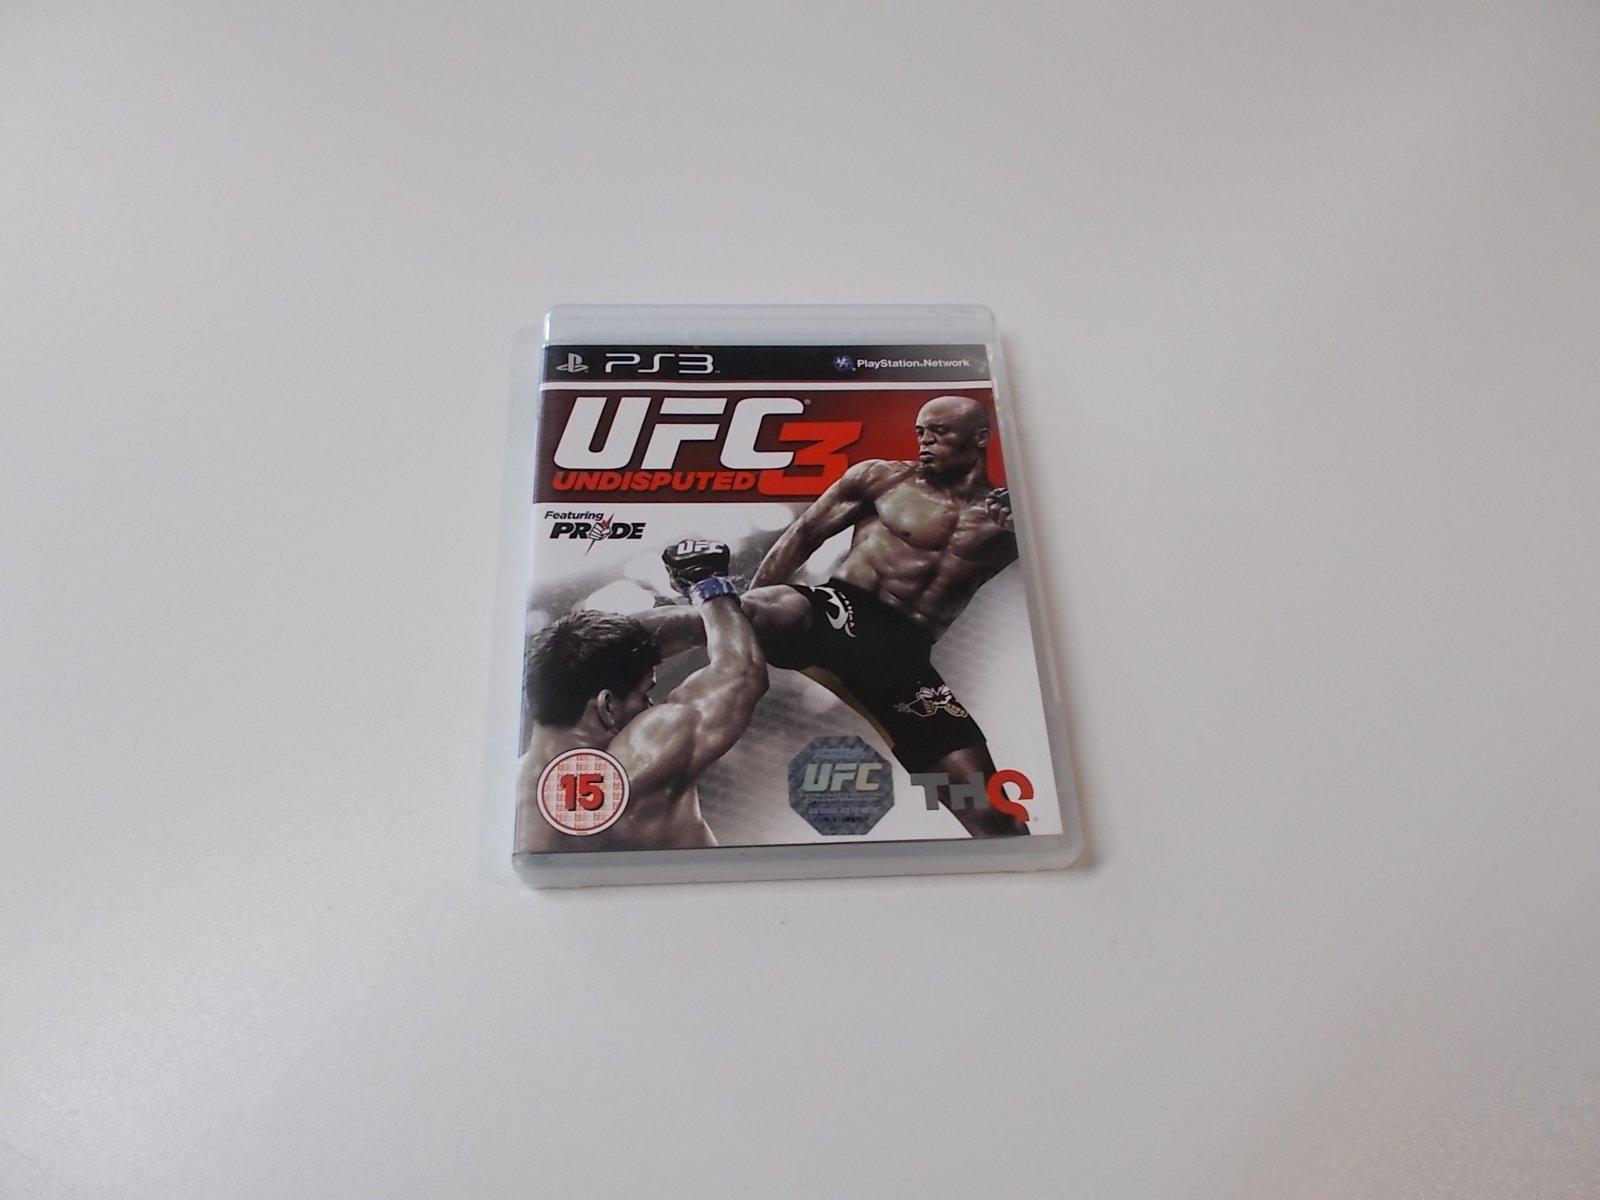 UFC Undisputed 3 - GRA Ps3 - Opole 0441